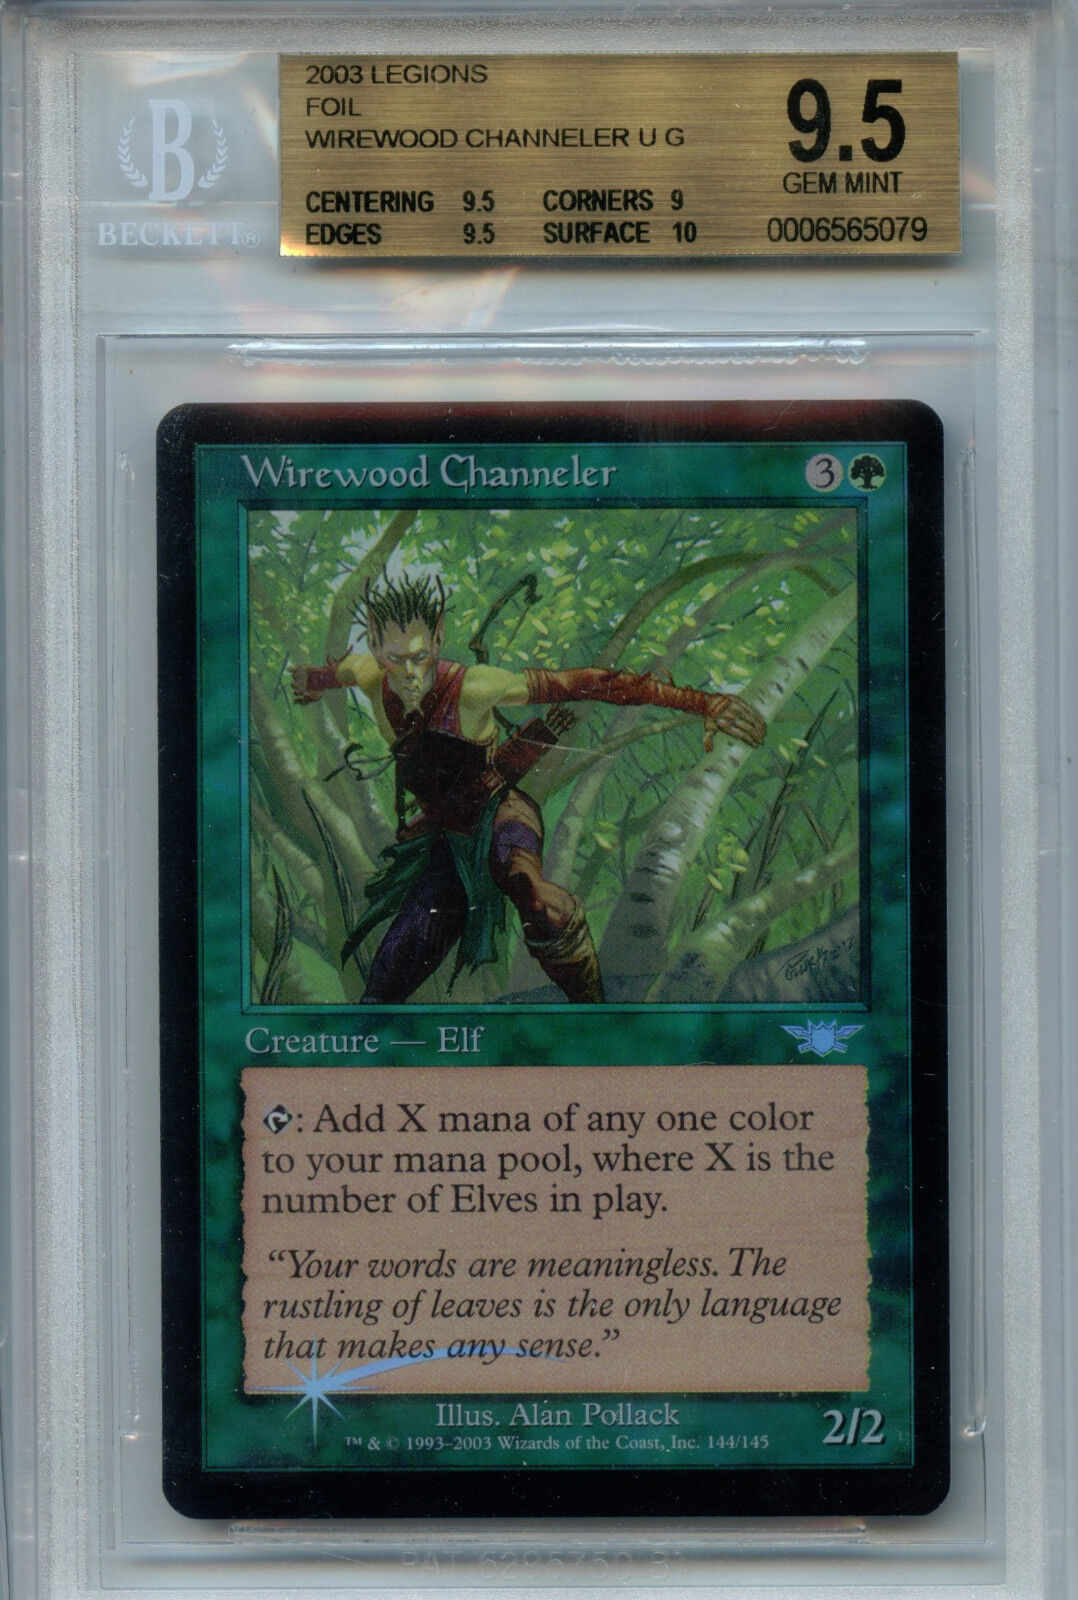 MTG Wirewood Channeler BGS 9.5 9.5 9.5 Gem Mint Legions Foil Magic Card Amricons 5079 cde5d5